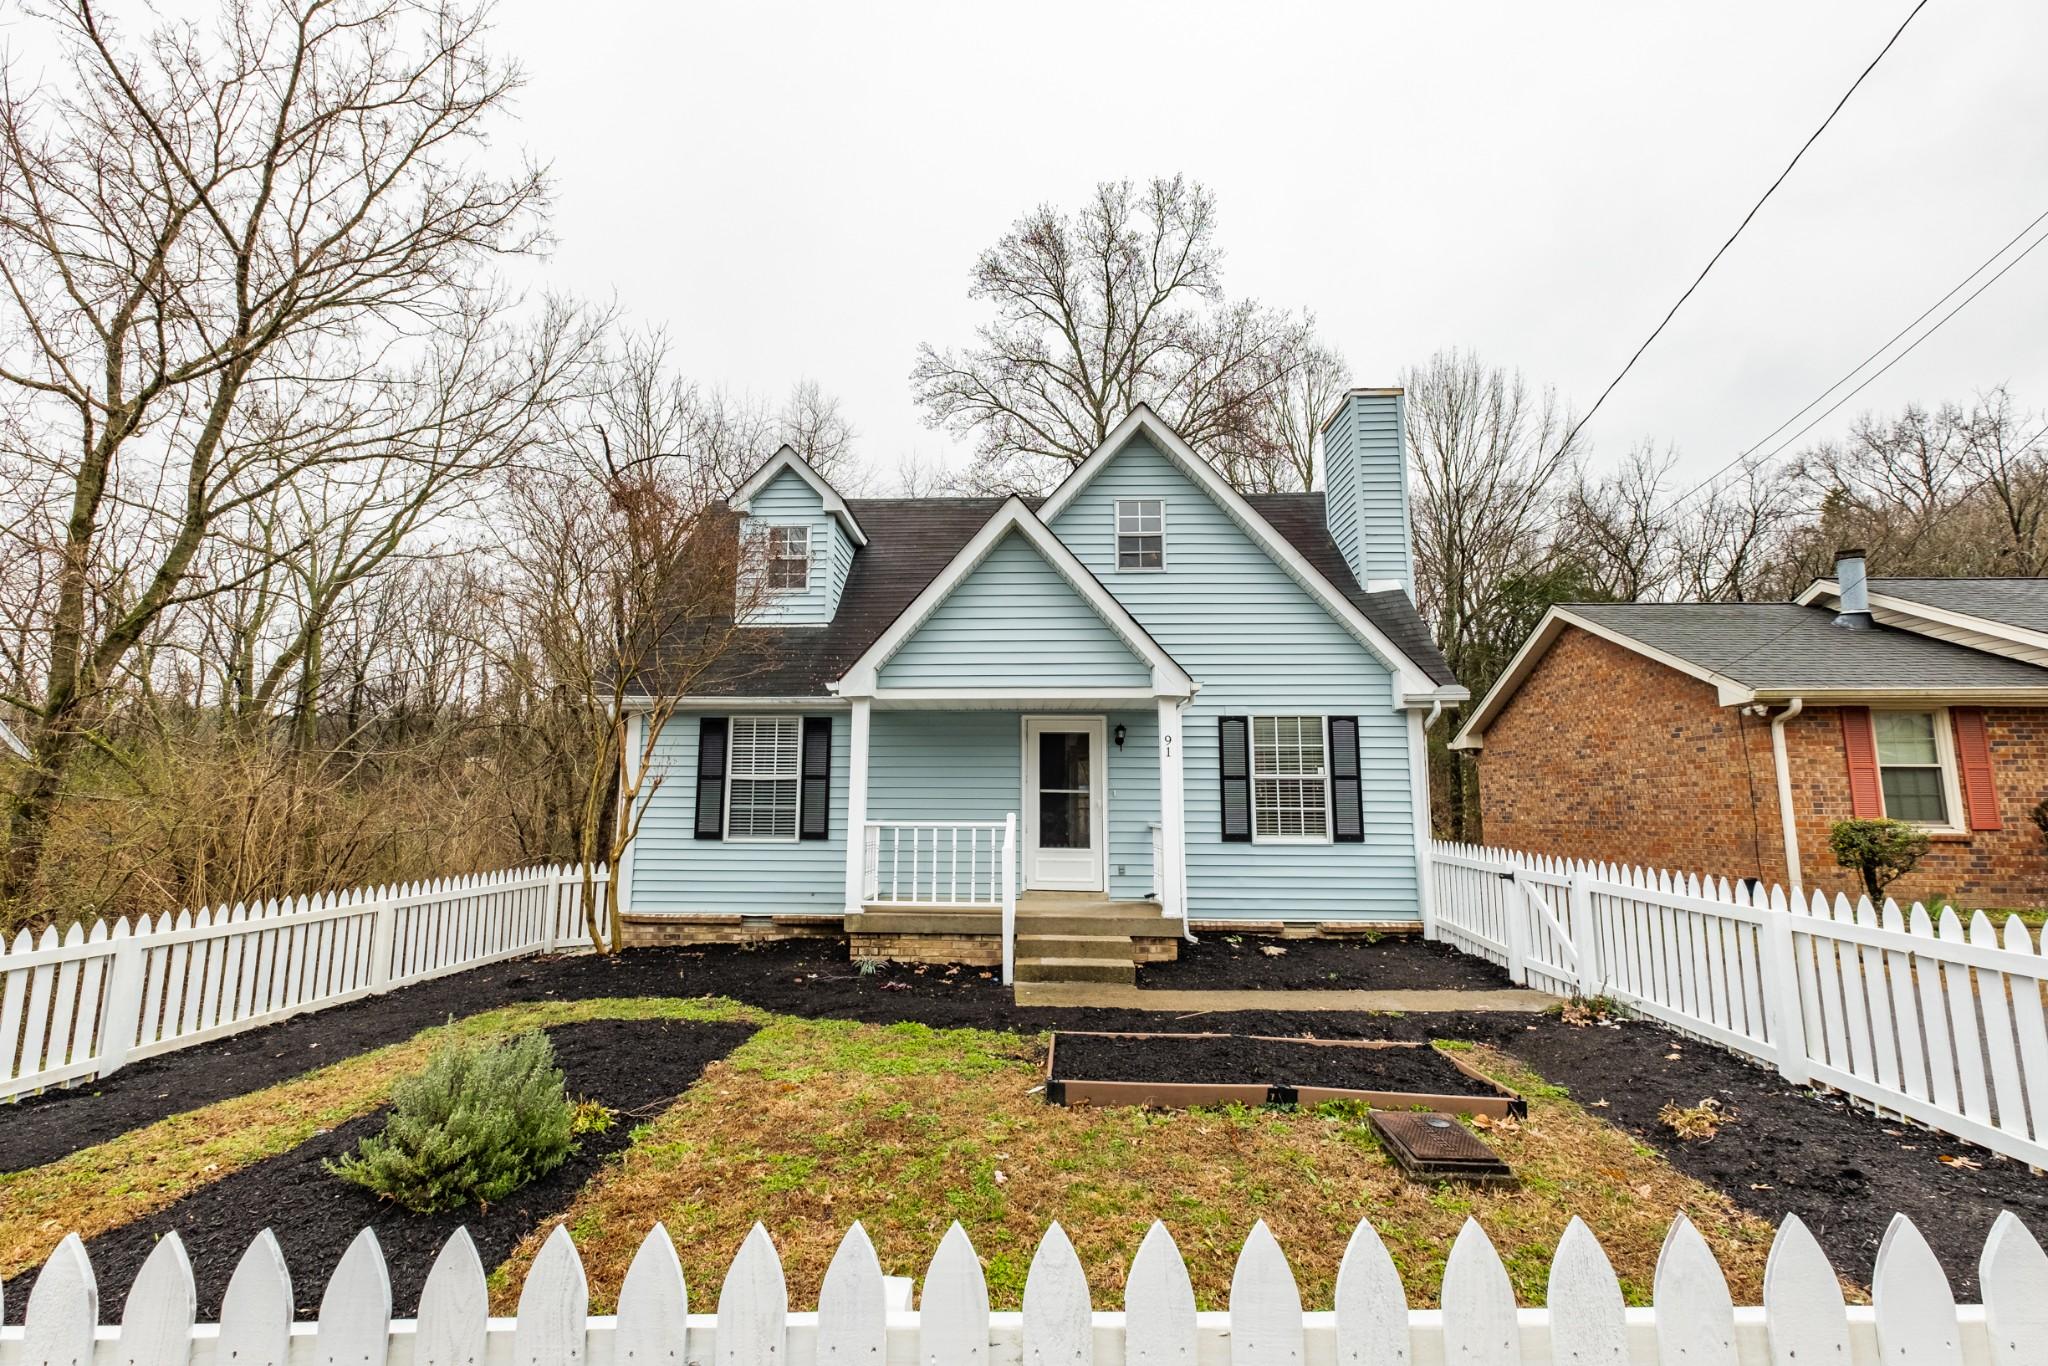 91 Ocala DR, Antioch, TN 37013 - Antioch, TN real estate listing